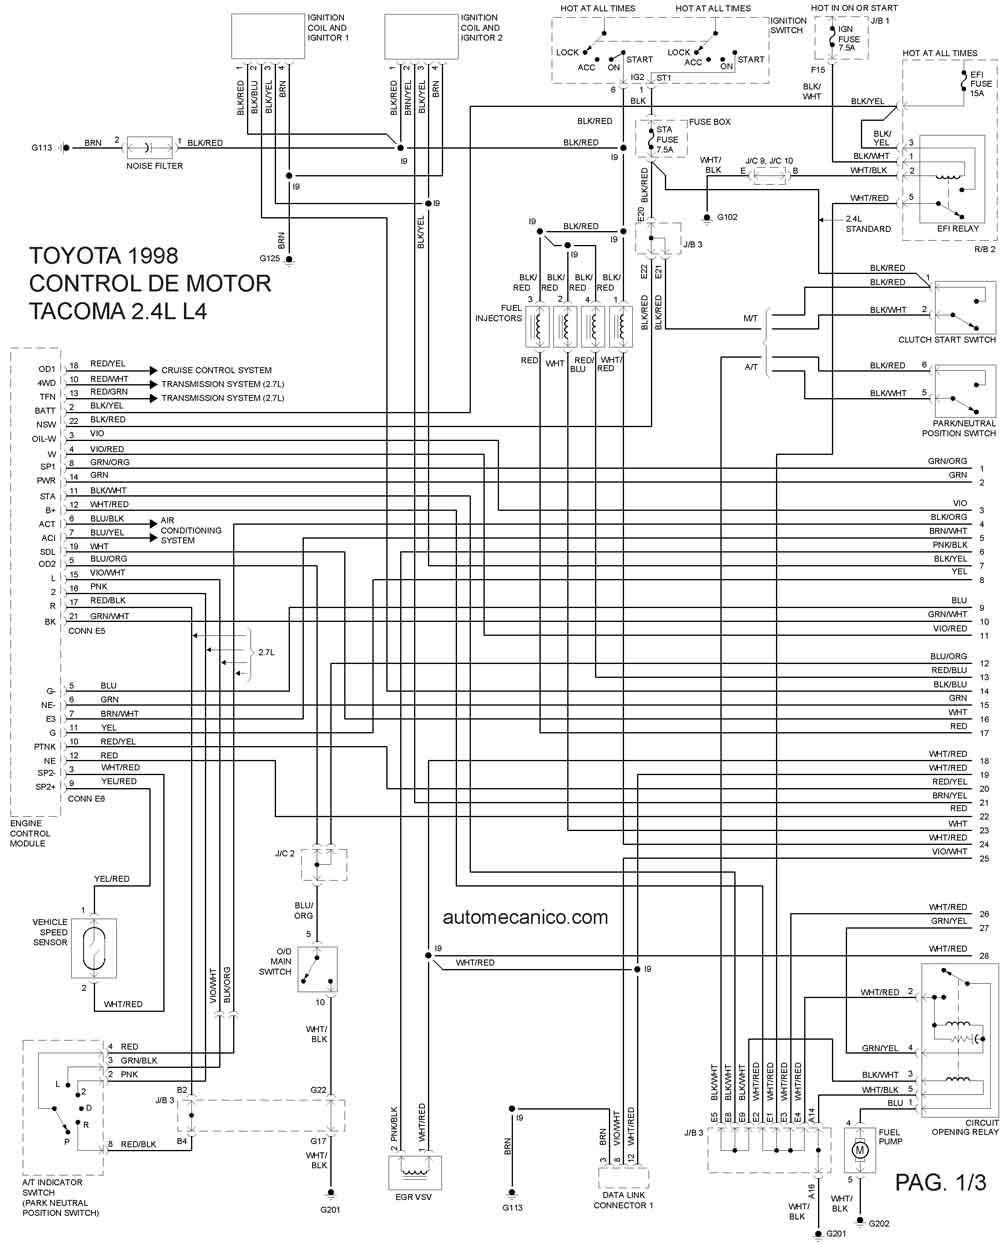 1994 mustang v6 wiring diagram toyota 1998 diagramas esquemas graphics vehiculos 2005 mustang v6 engine diagram